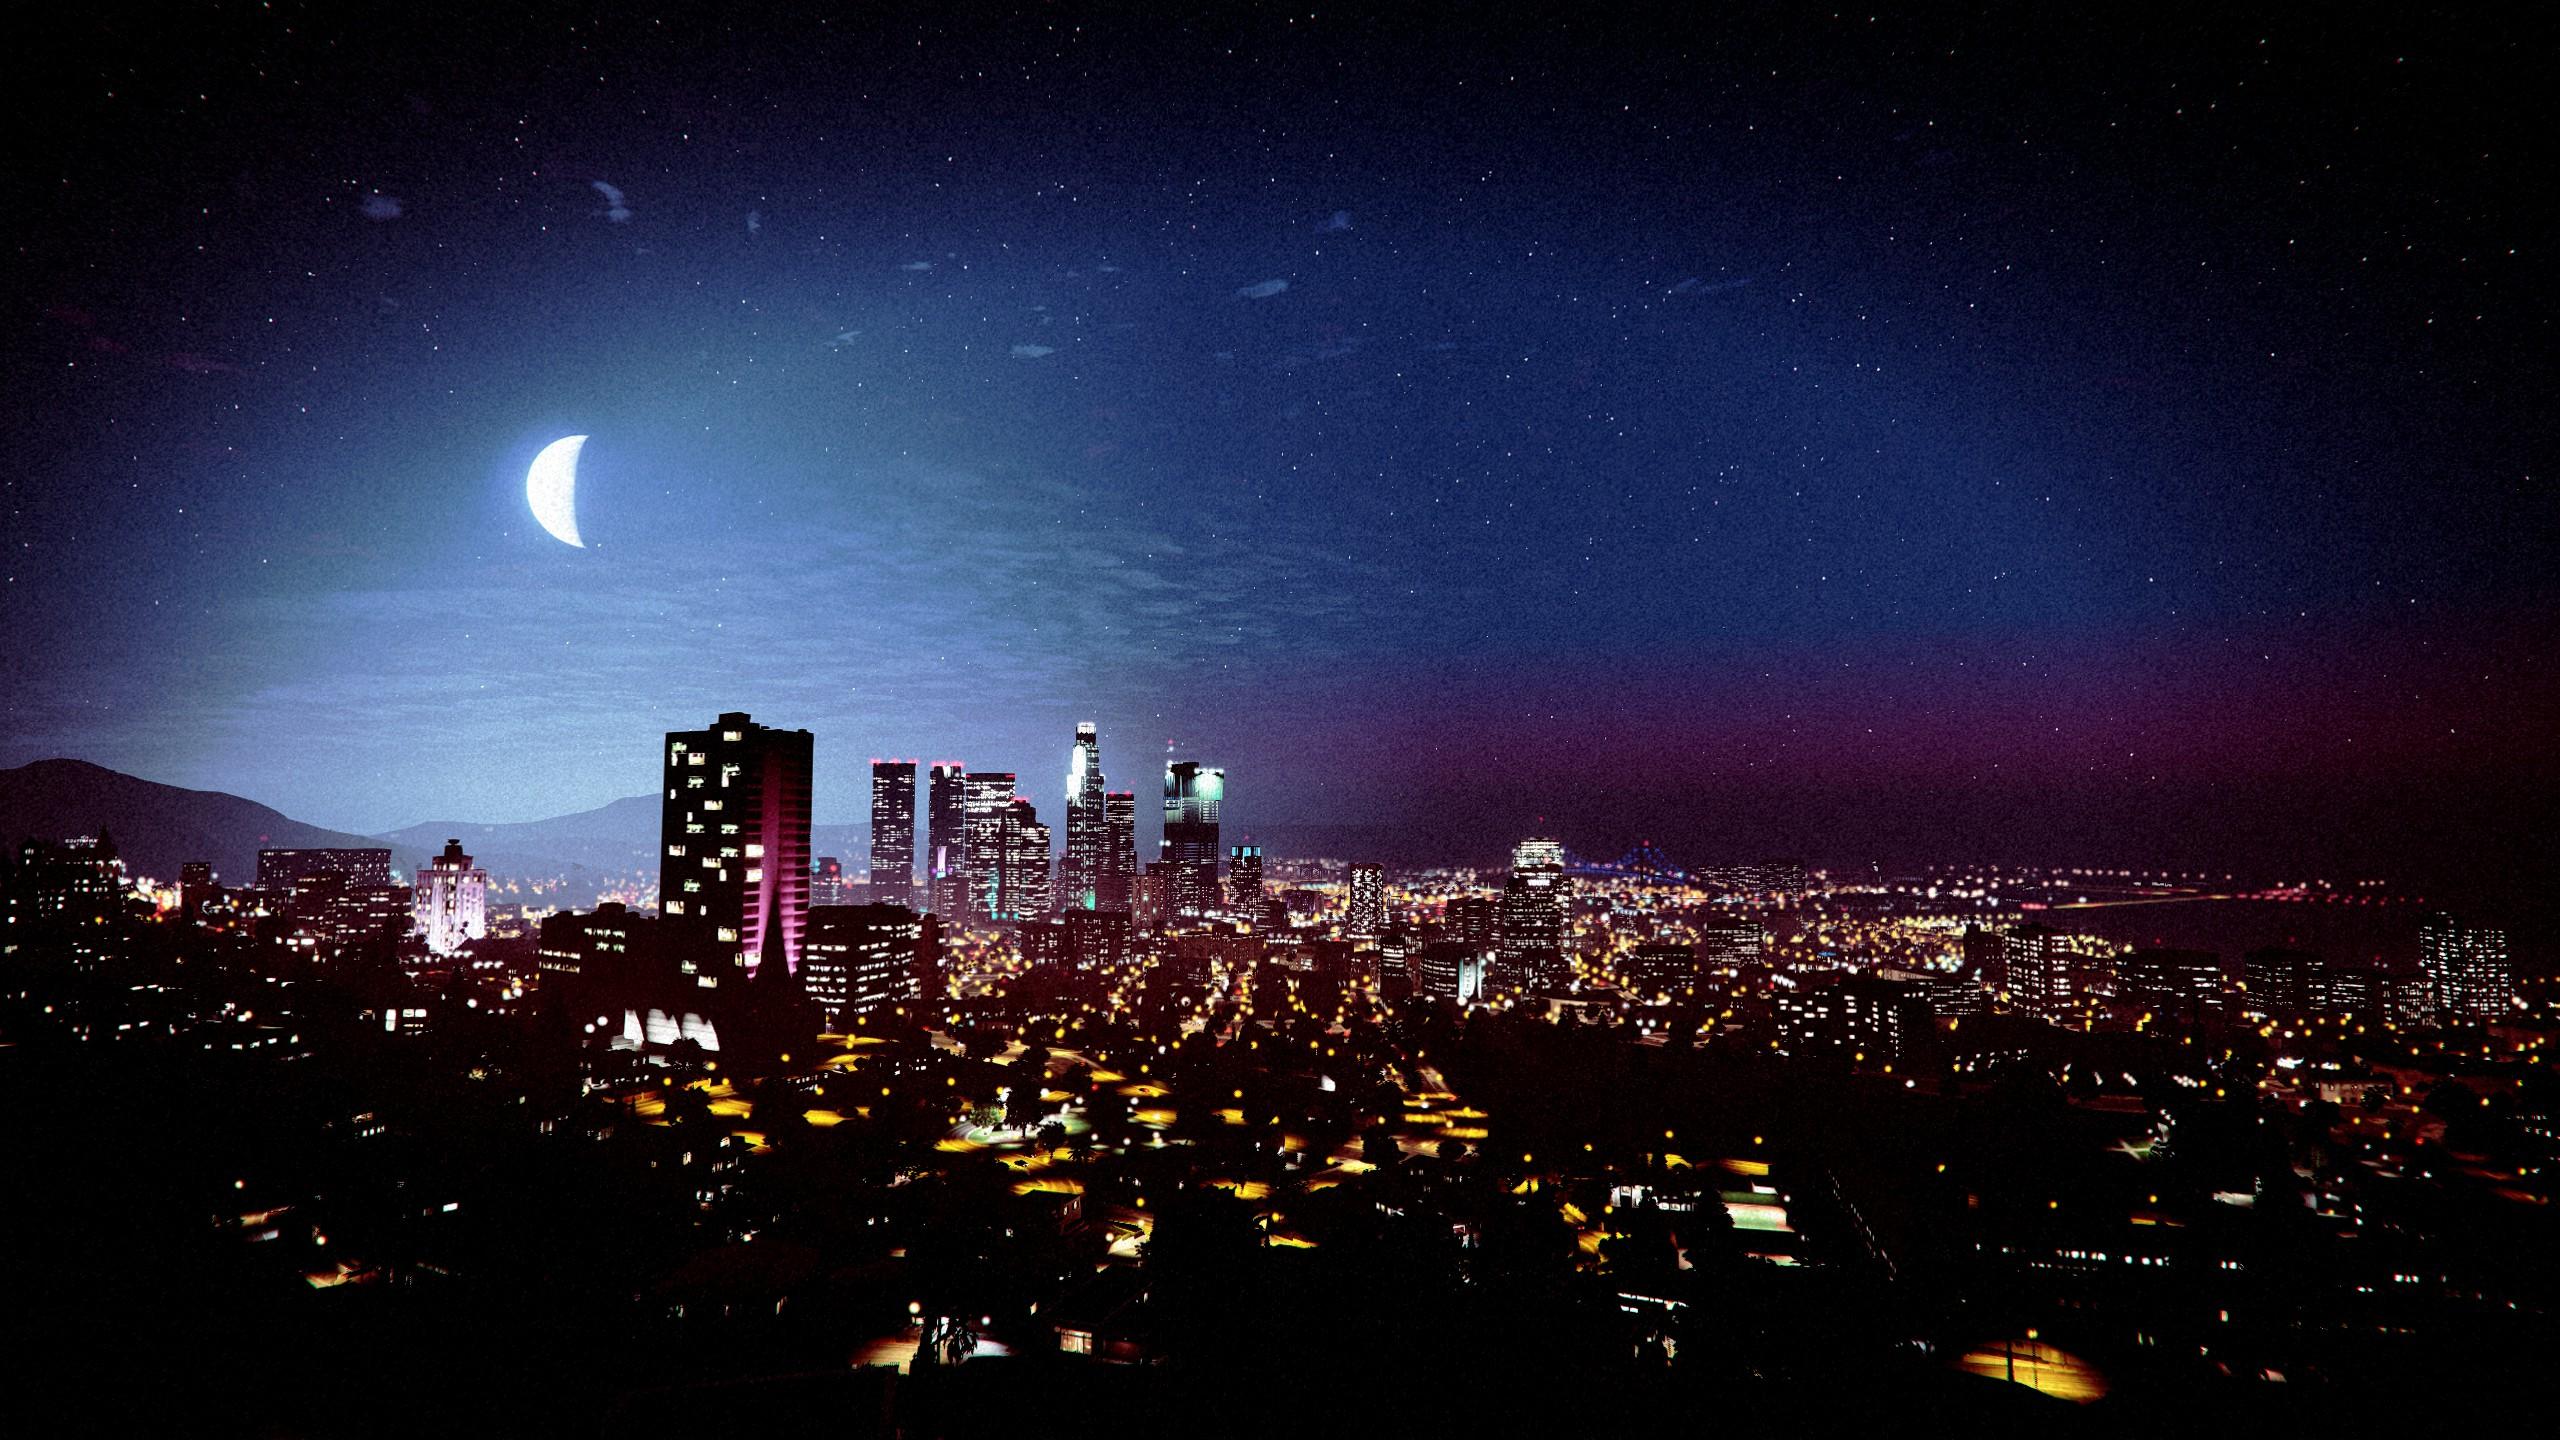 Gta V Iphone 5 Wallpaper Grand Theft Auto V Hd Wallpaper Background Image